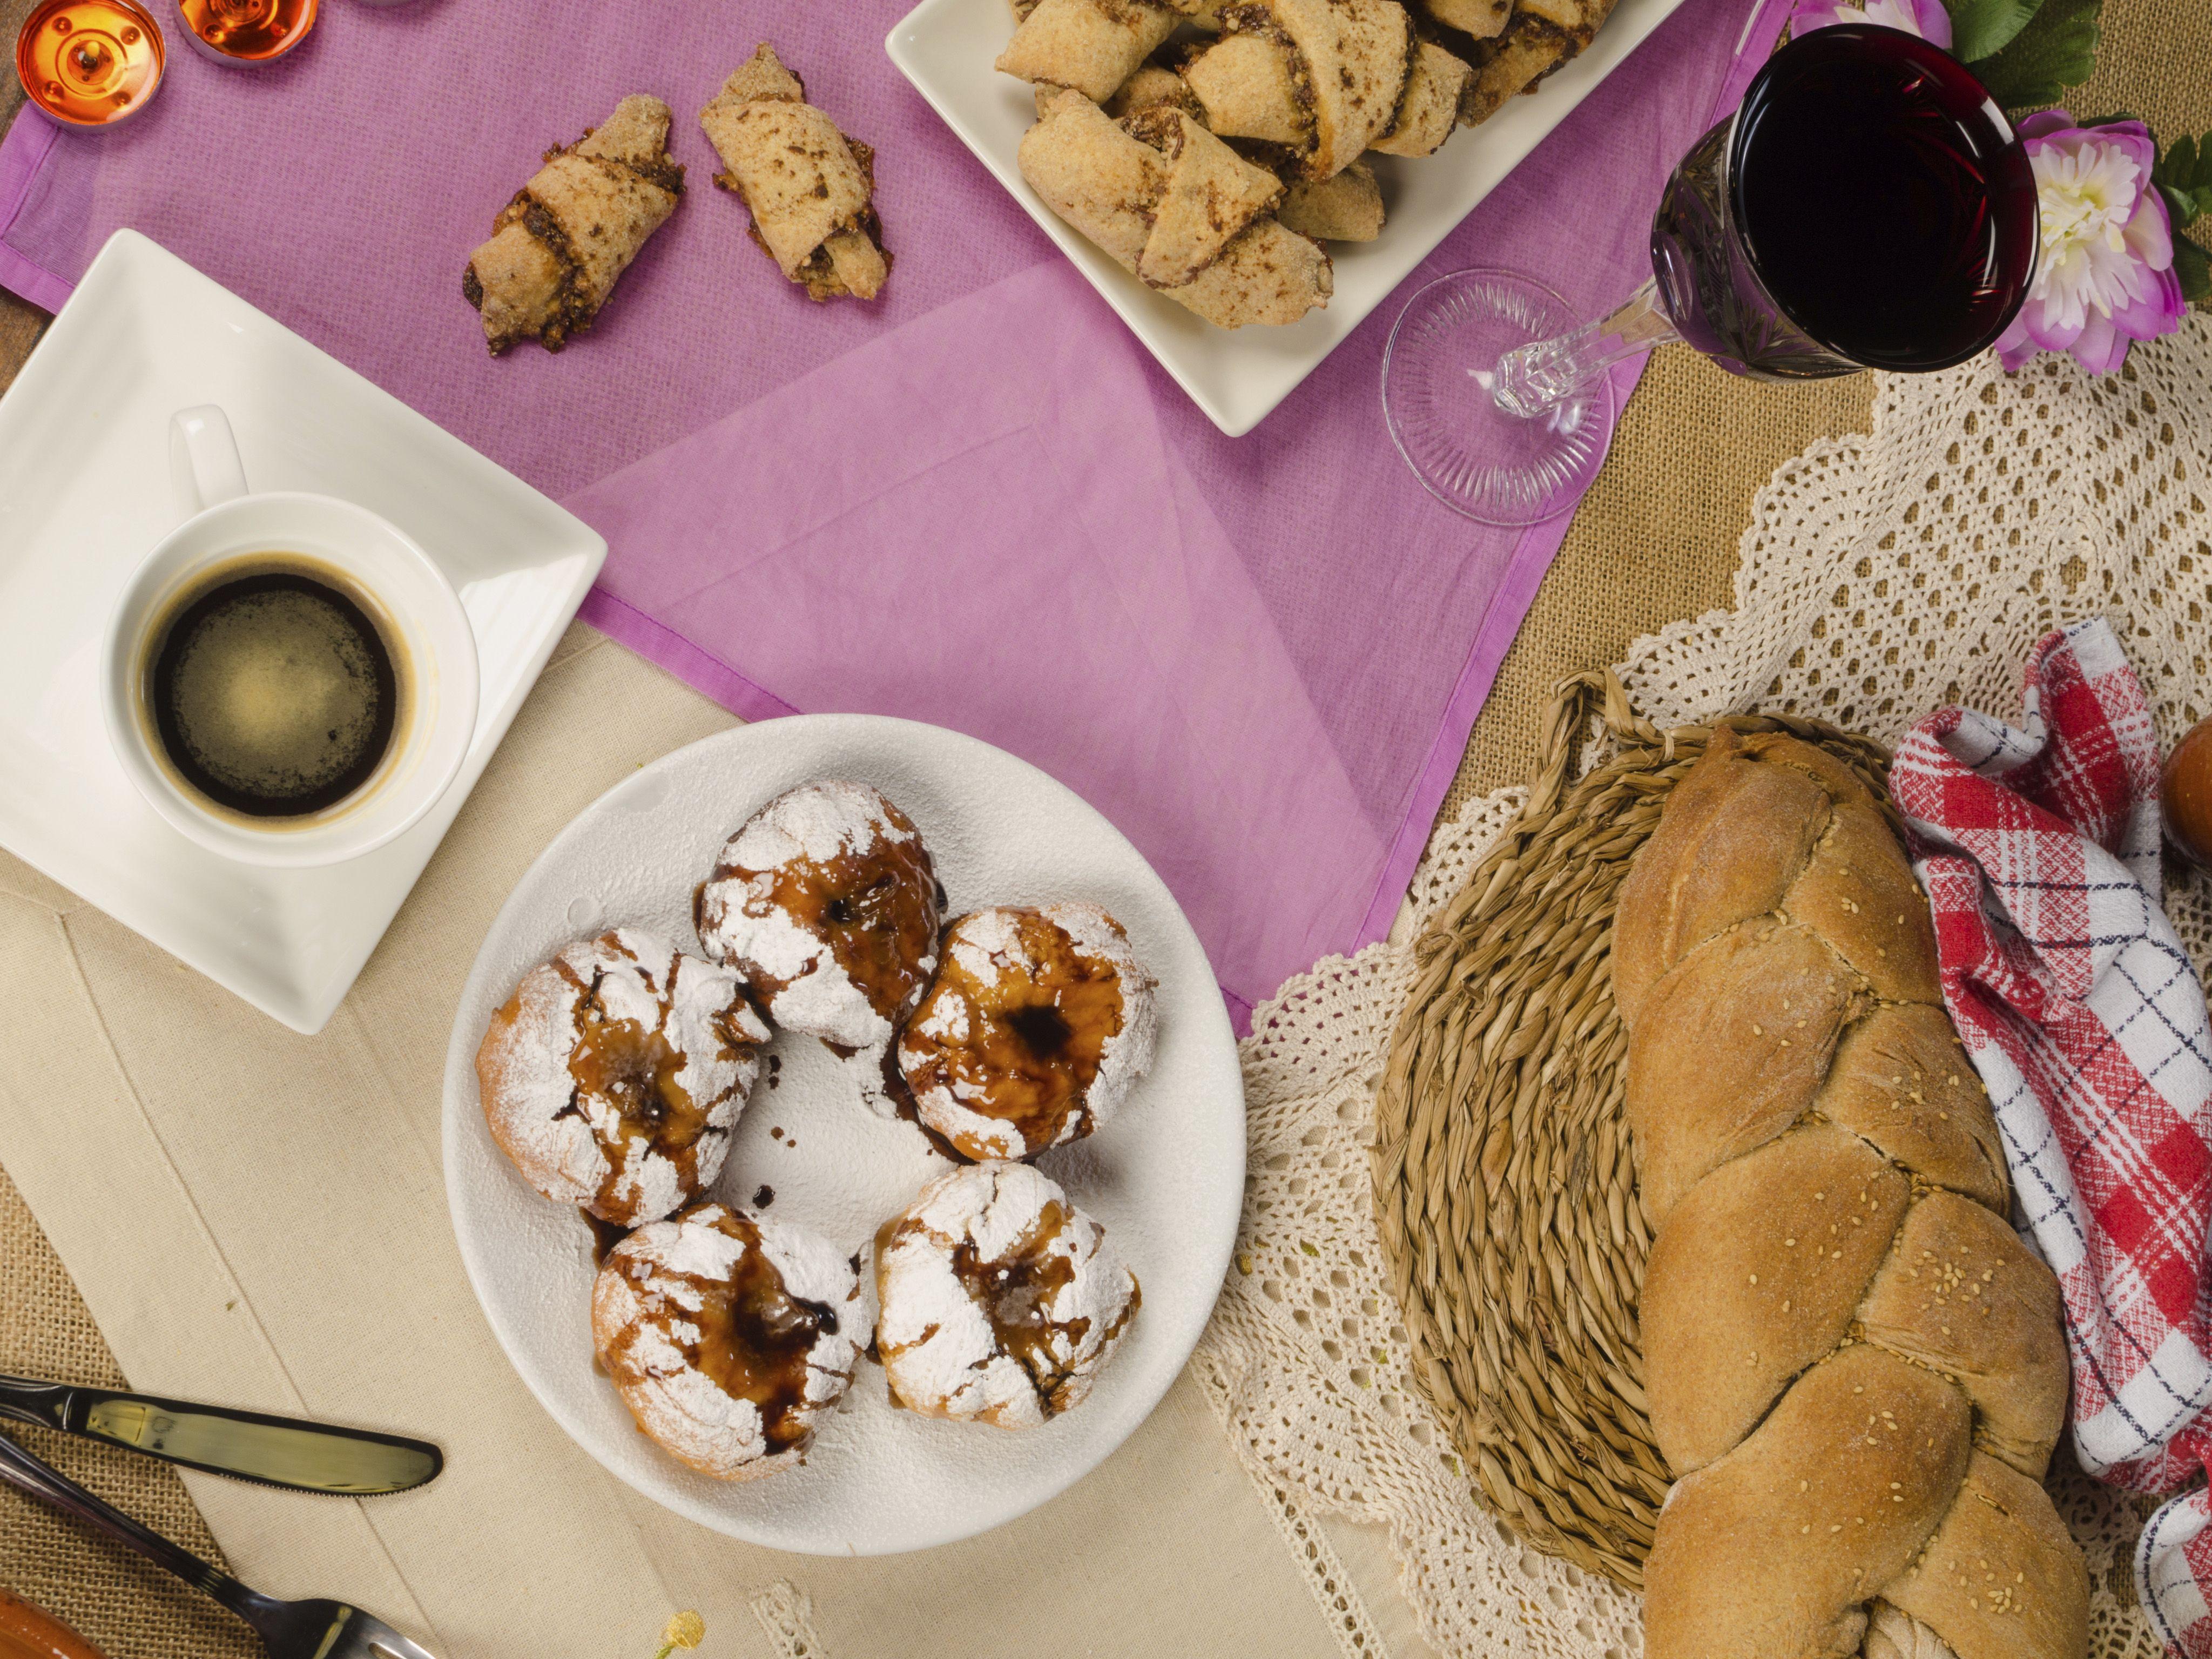 Hanukkah The Food and Traditions Hanukkah food